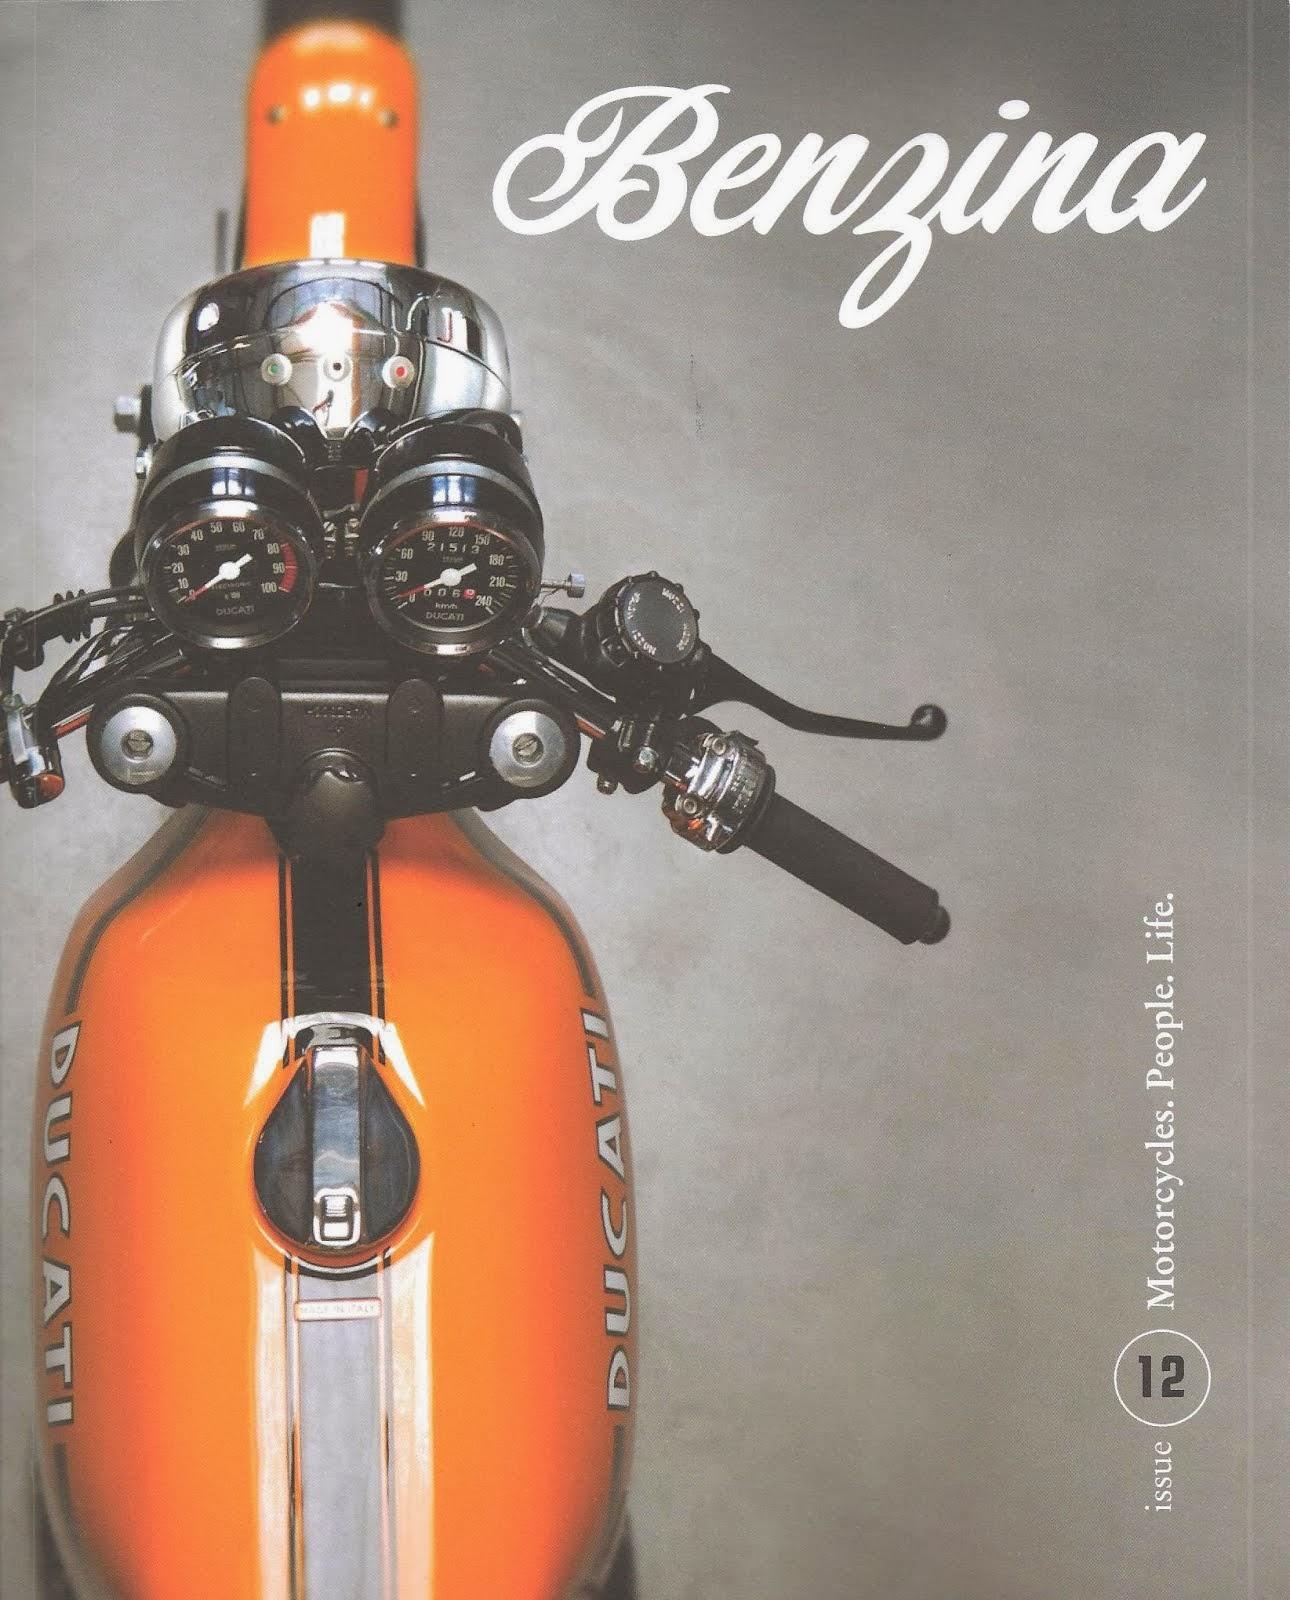 Benzina magazine